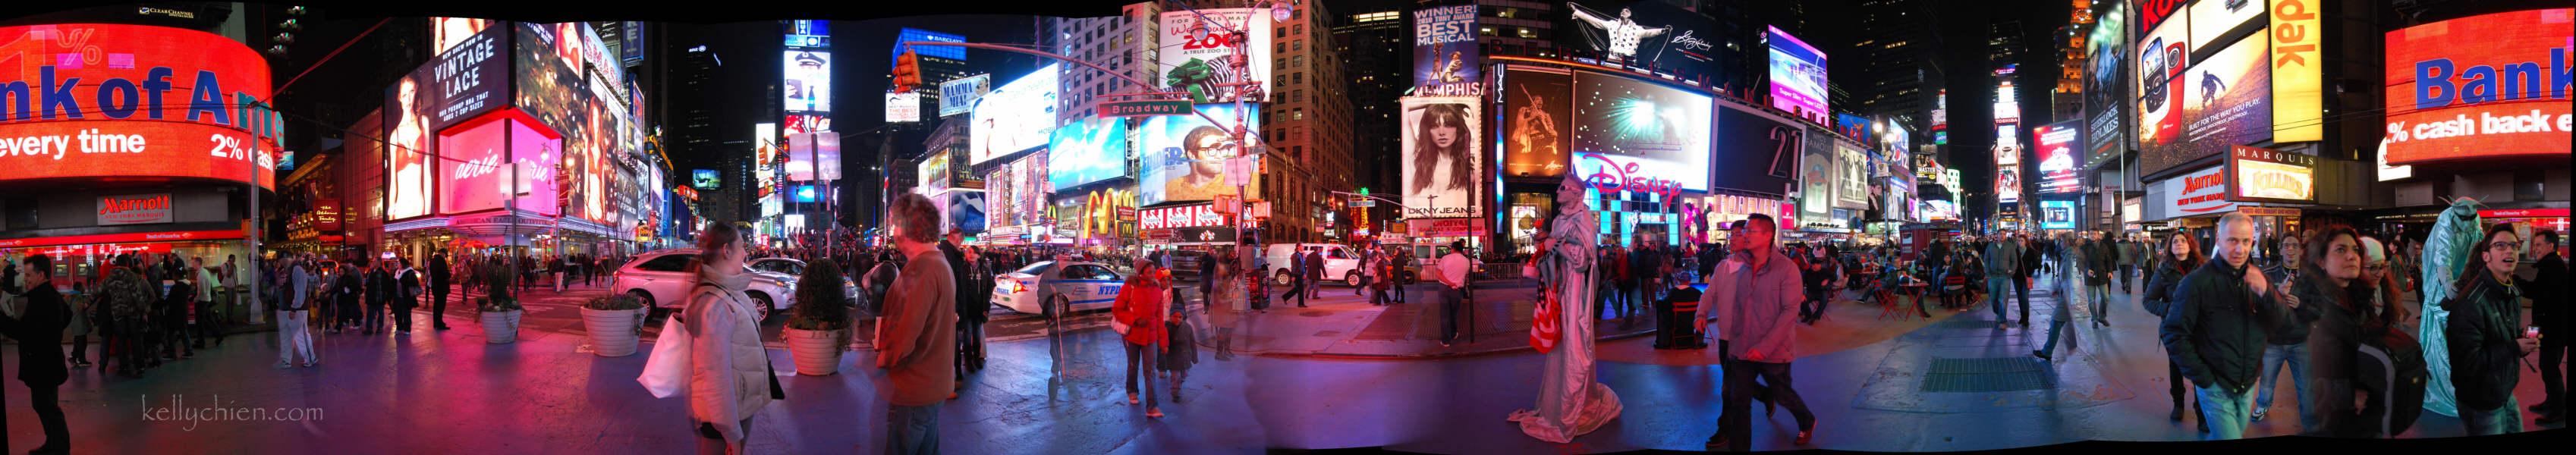 Panoramic Time Square